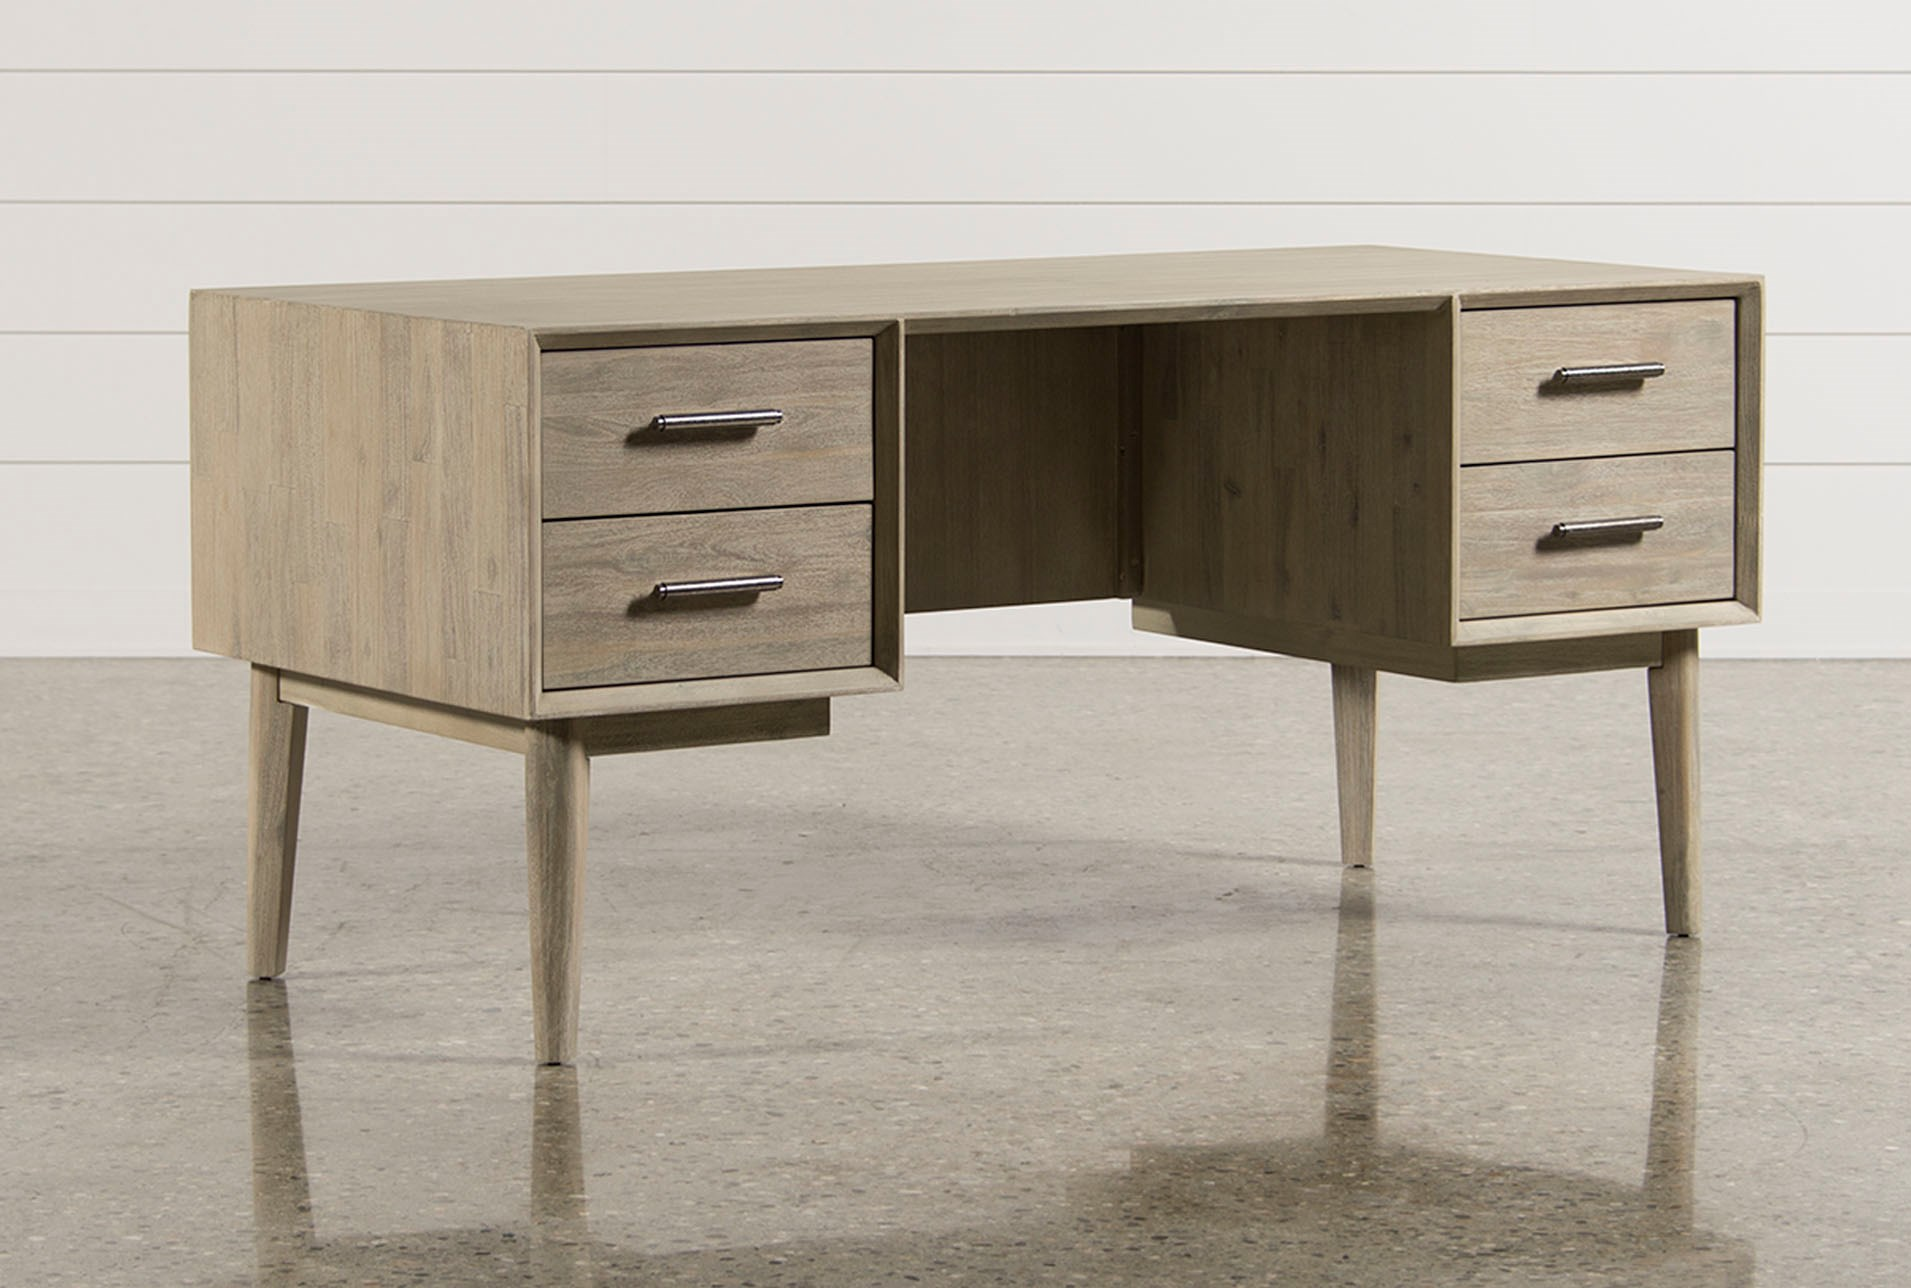 home office desk chairs chic slim. Display Product Reviews For ALLEN DESK Home Office Desk Chairs Chic Slim